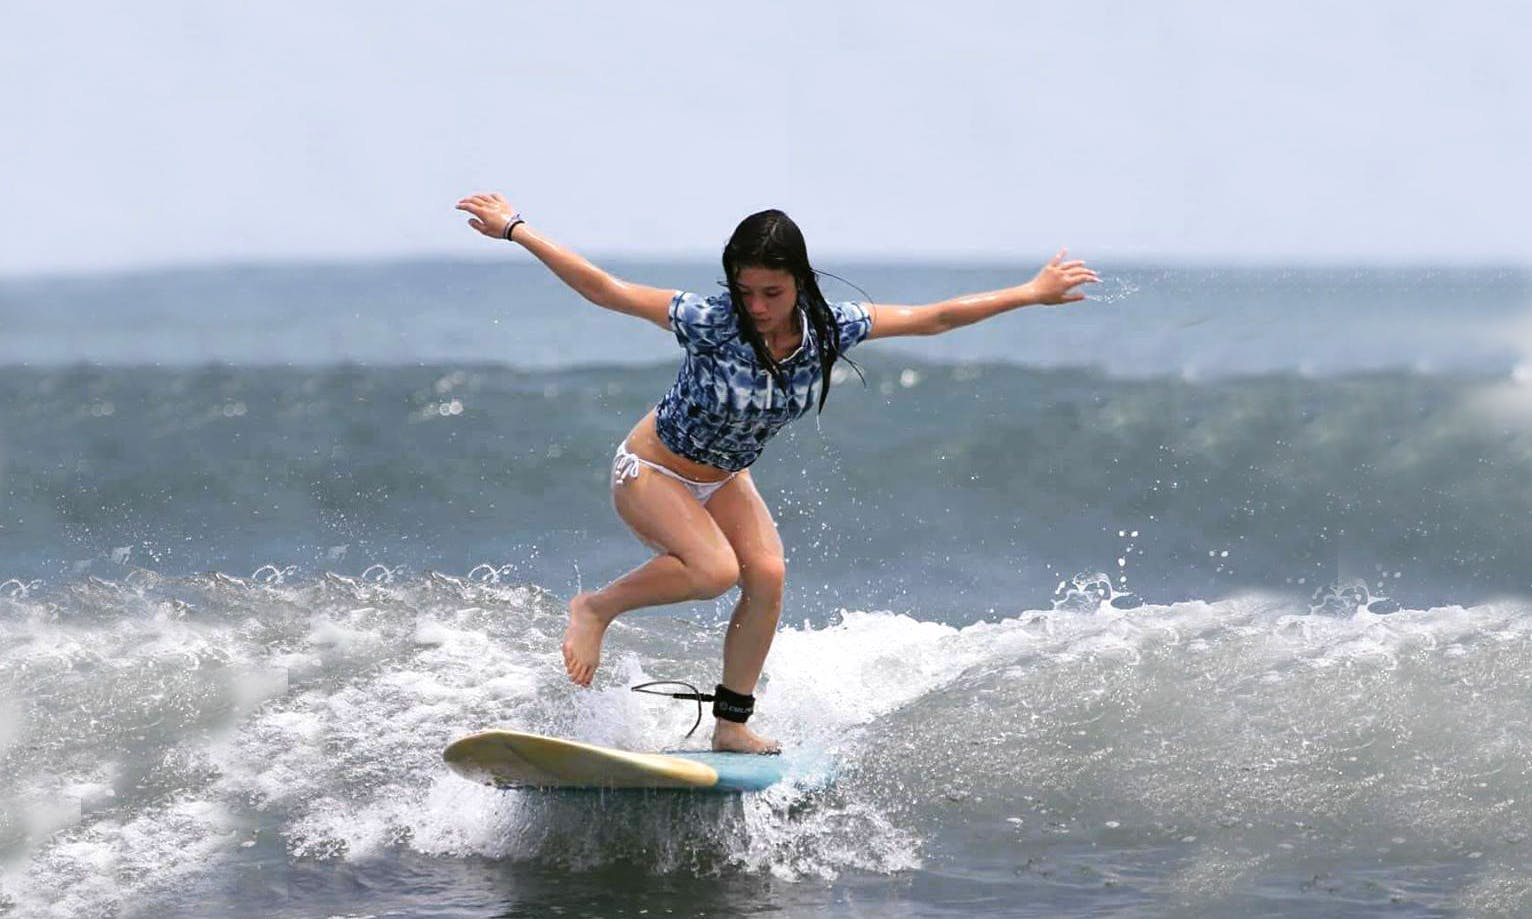 Fun Surf Lessons in Kuta, Bali